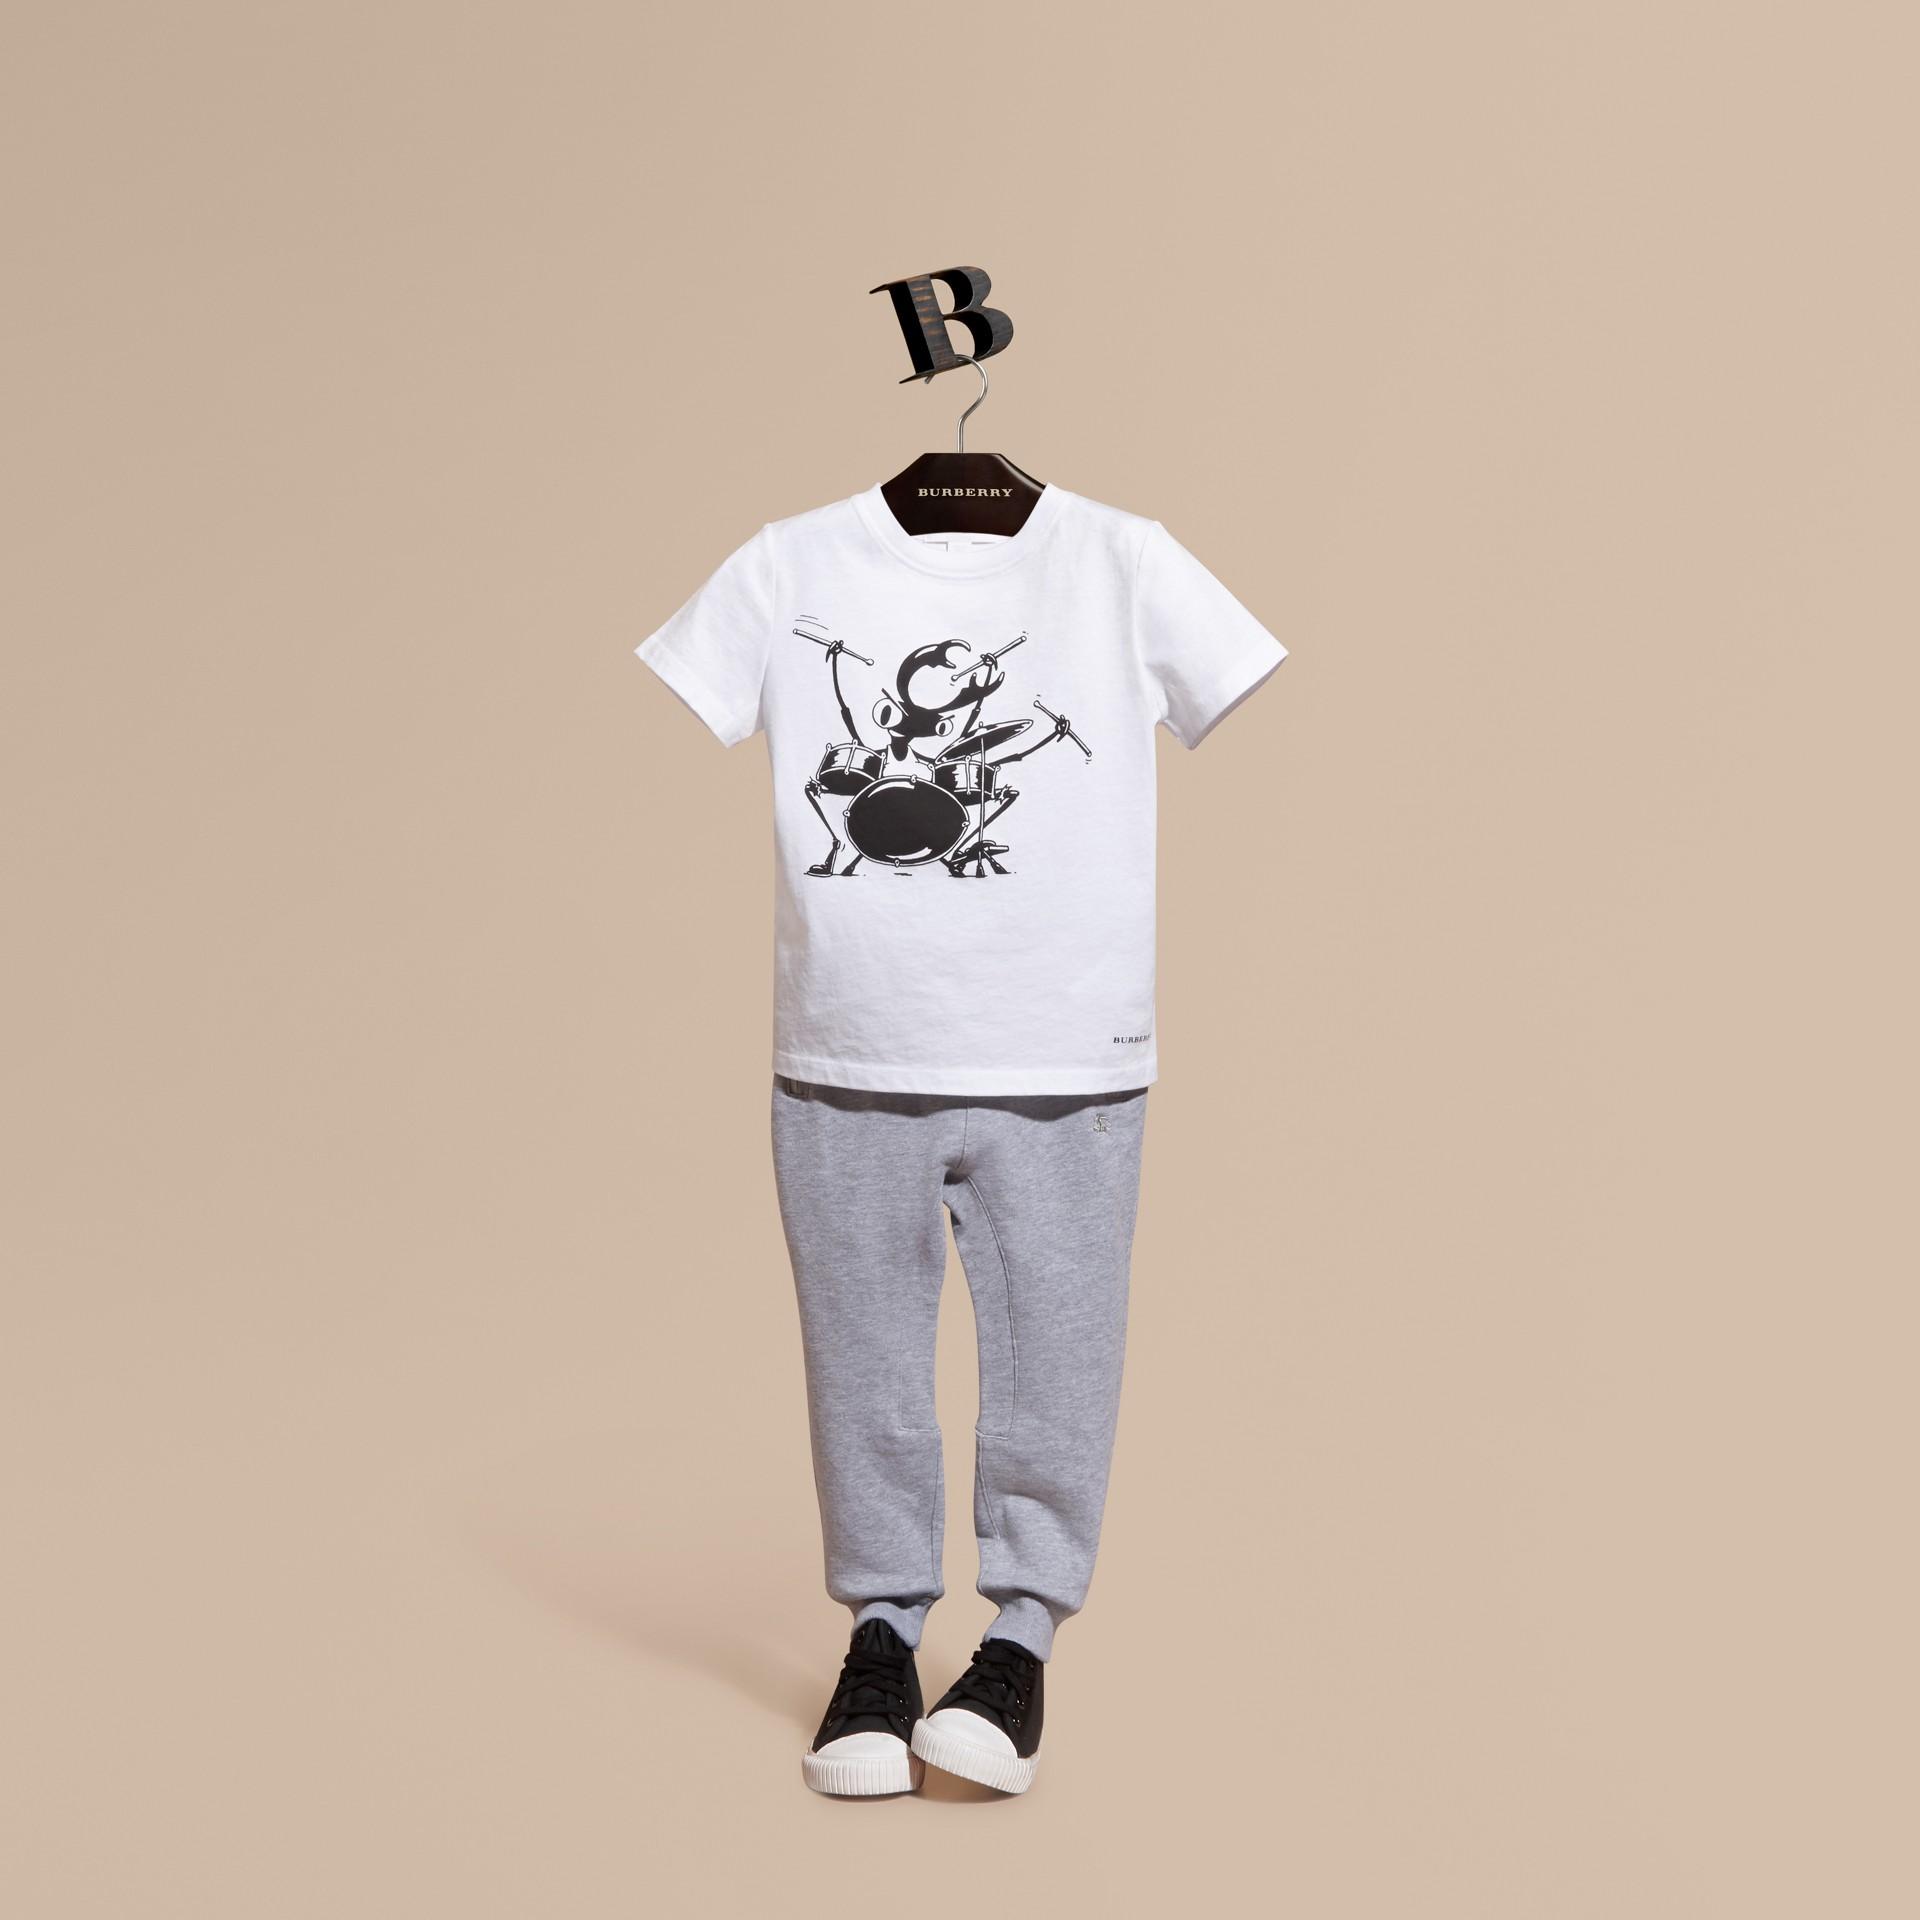 Camaïeu de gris moyens Pantalon de survêtement en coton Camaïeu  Gris Moyens - photo de la galerie 1